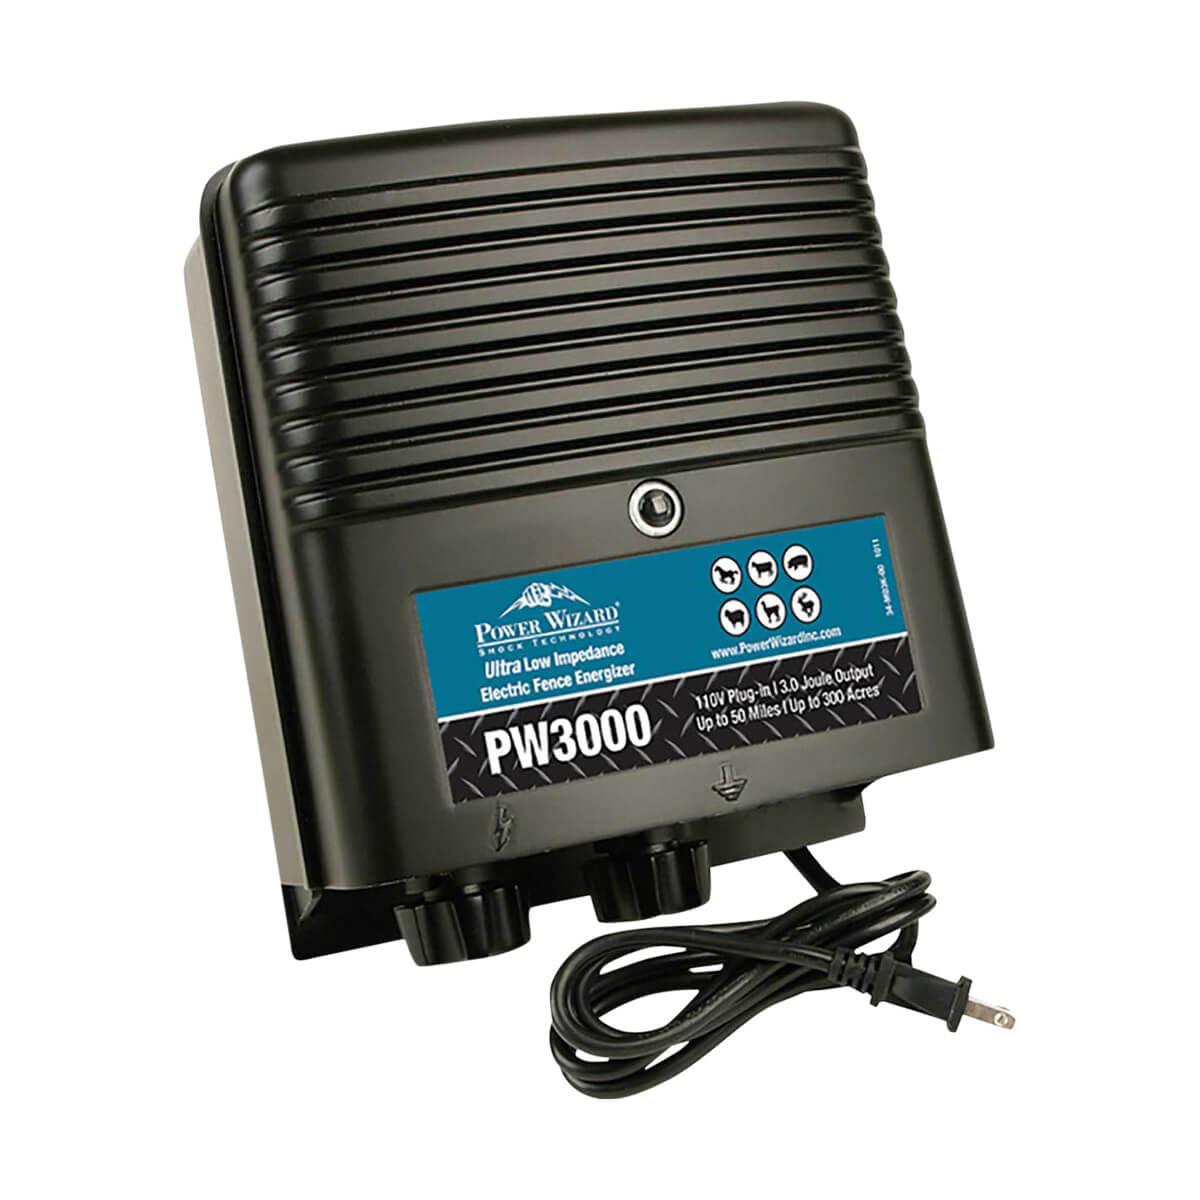 Power Wizard PW3000 Energizer